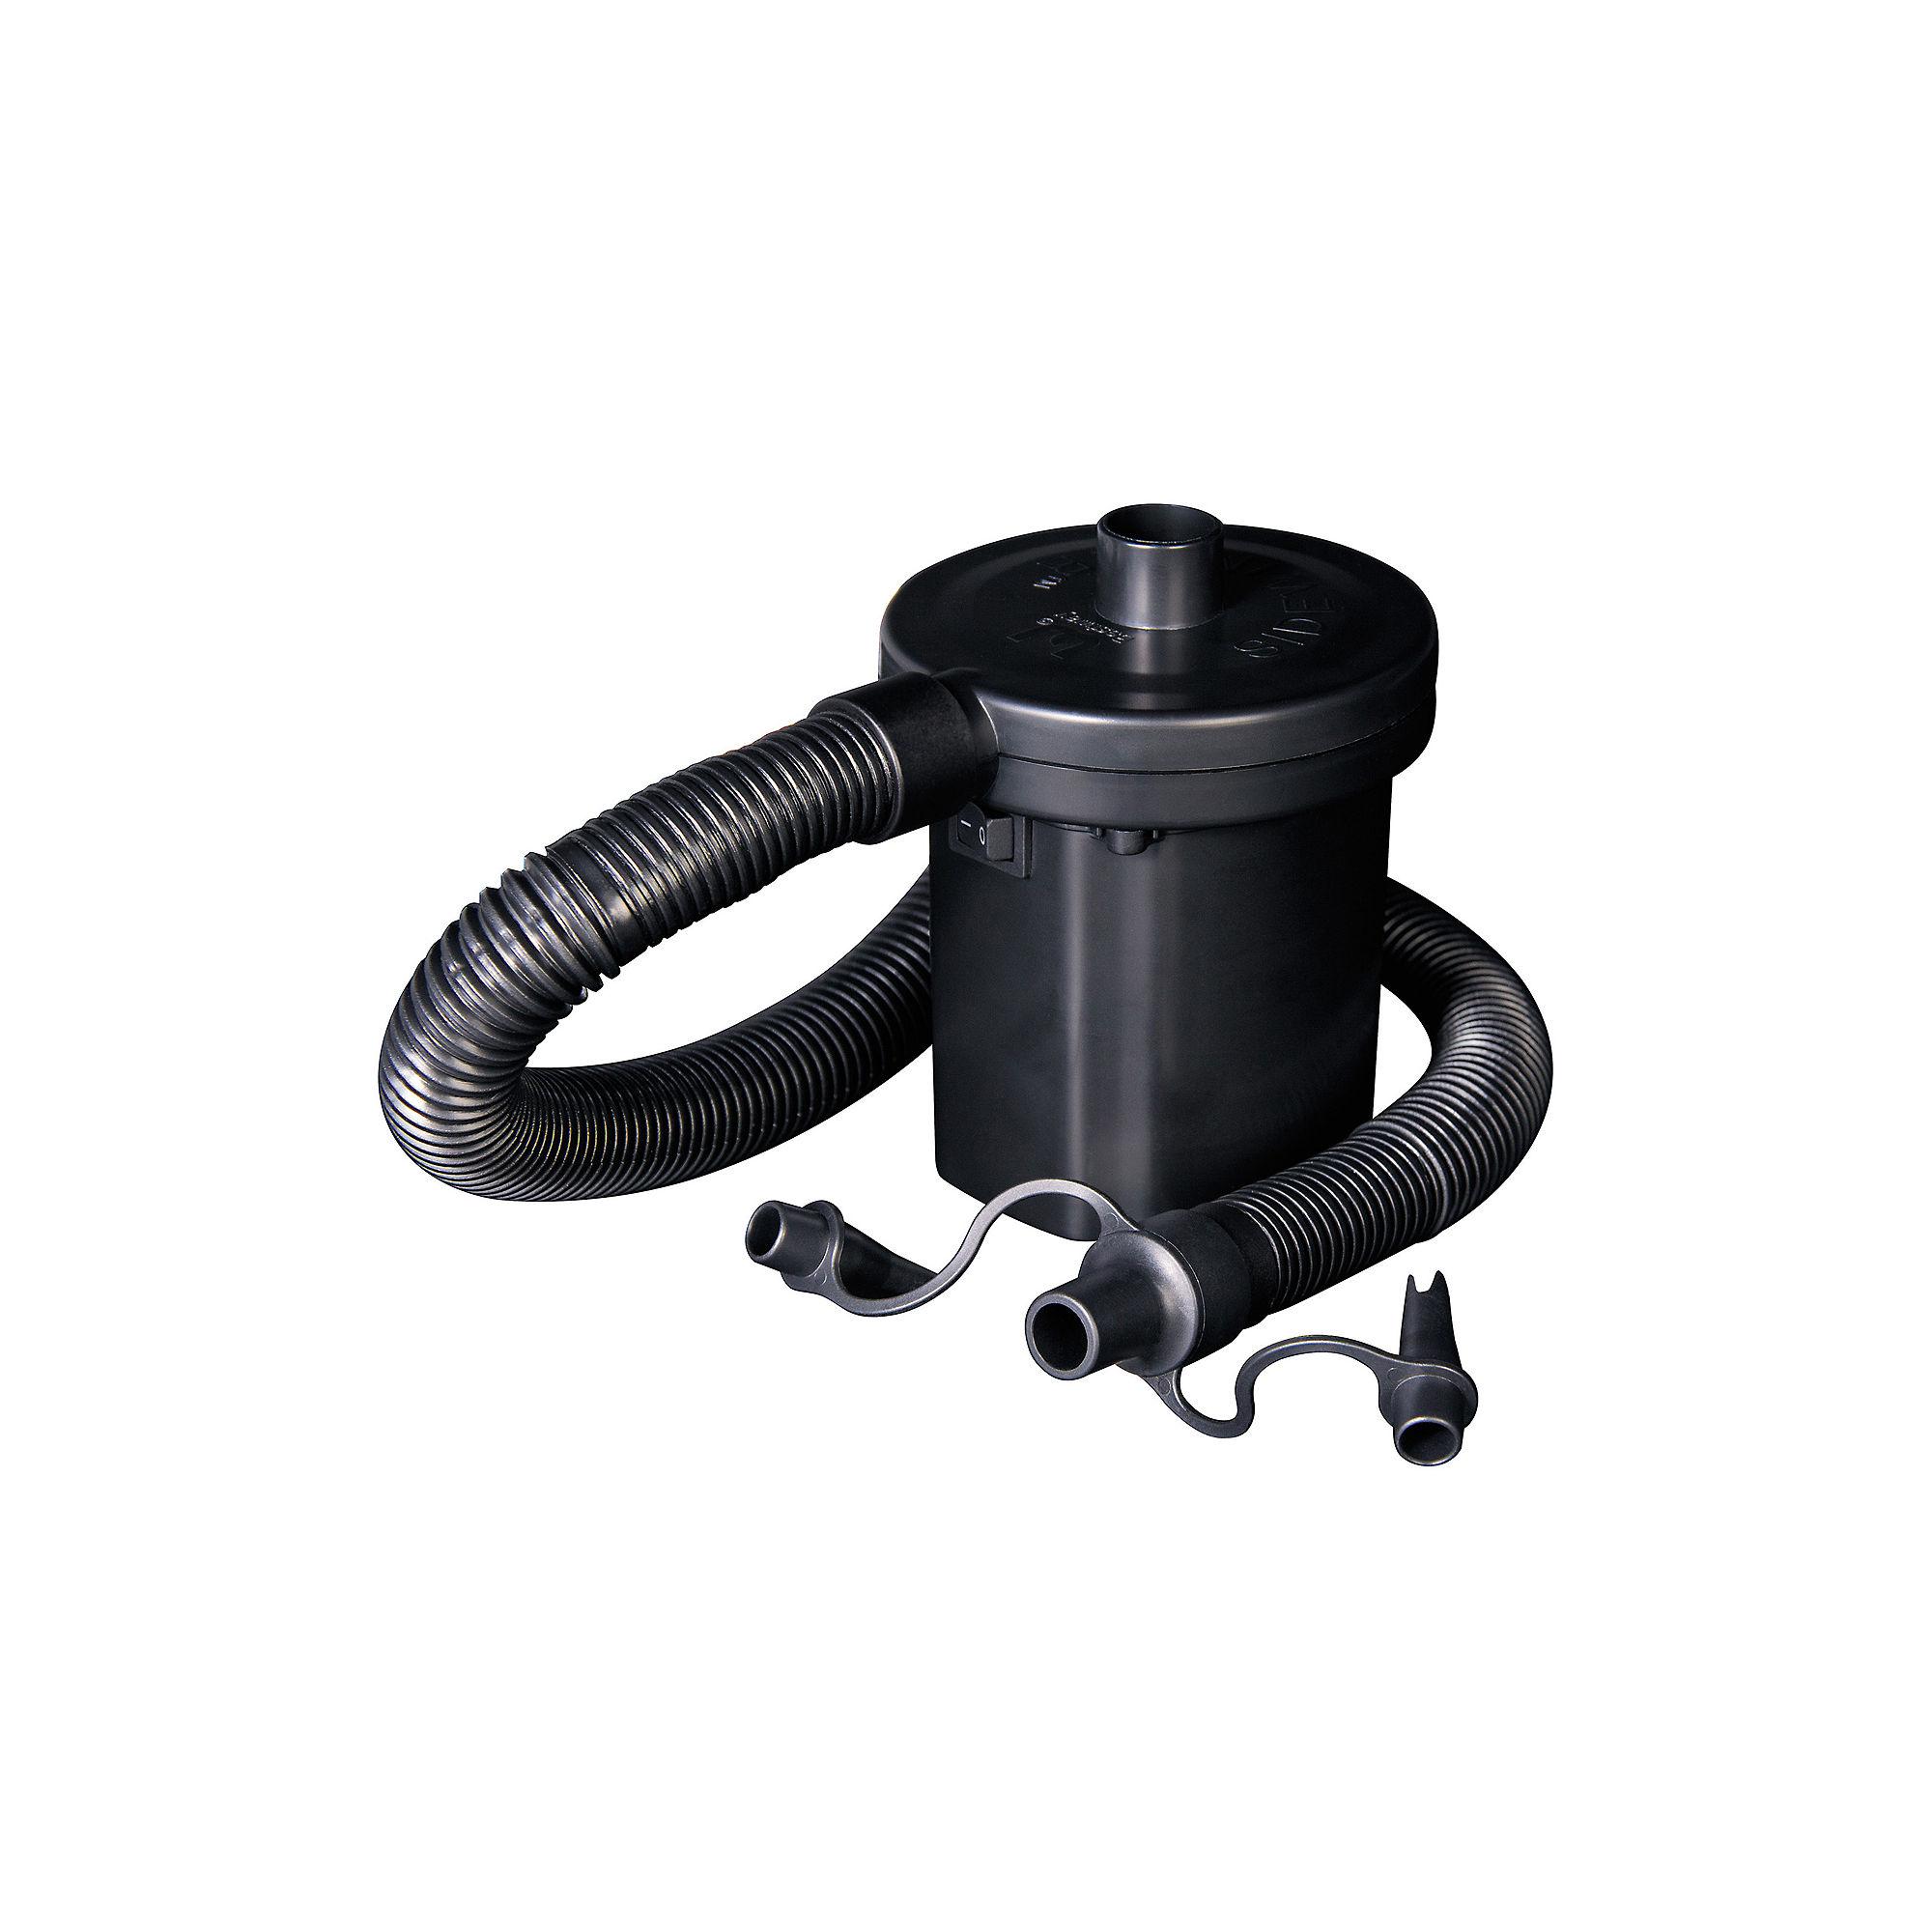 UPC 821808620791 product image for Sidewinder Pool Pumps | upcitemdb.com